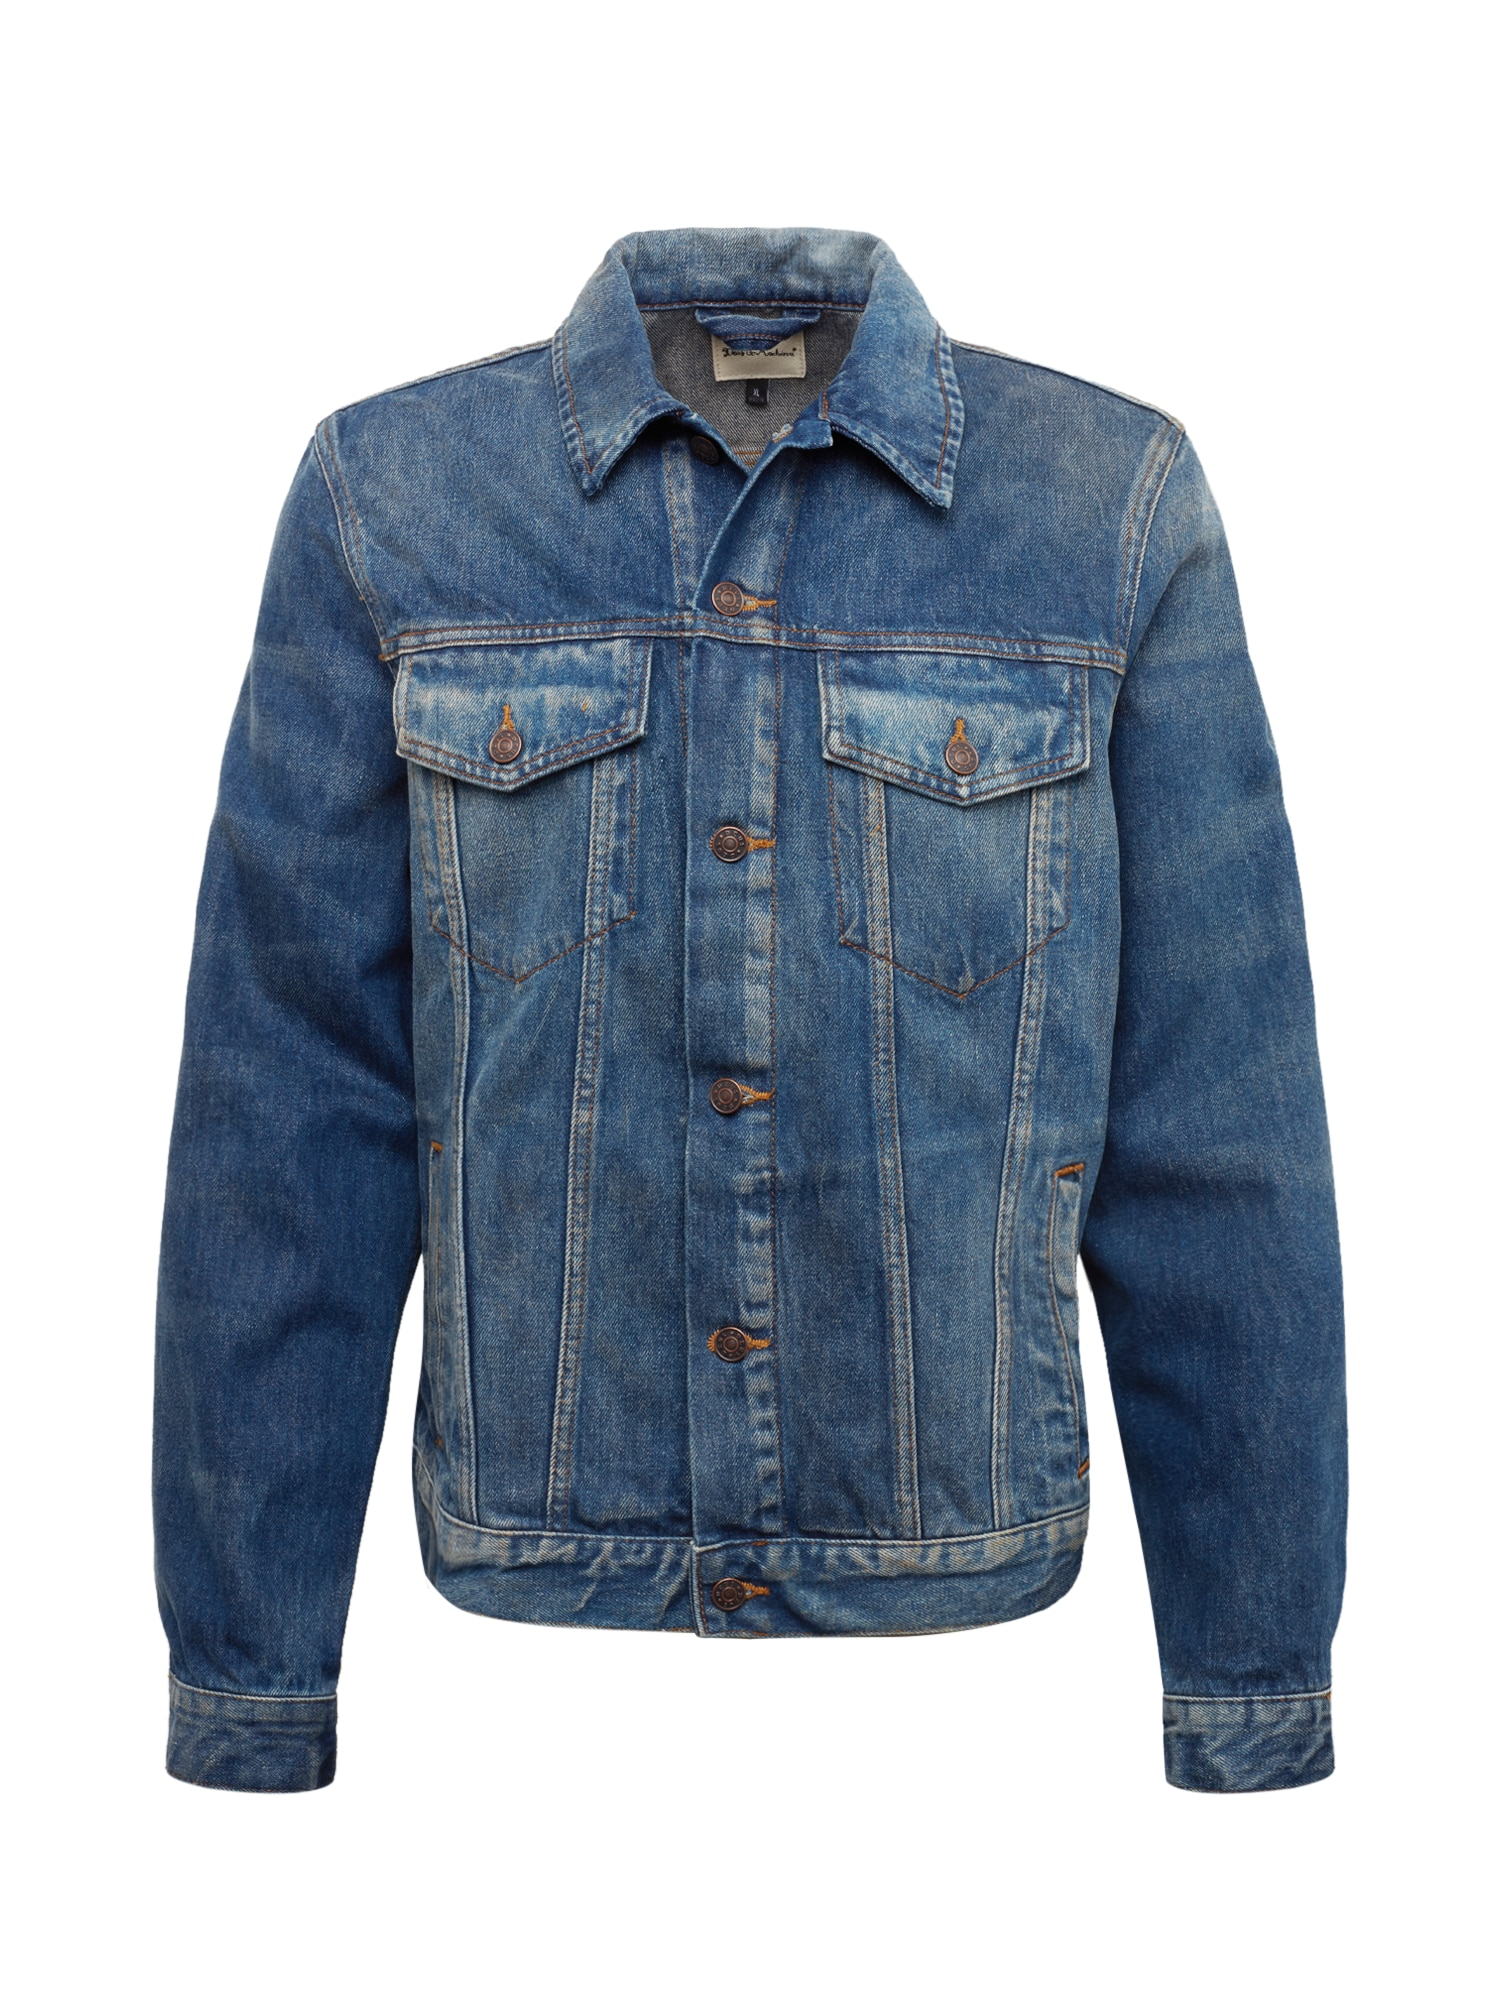 Přechodná bunda Ronald modrá džínovina DEUS EX MACHINA